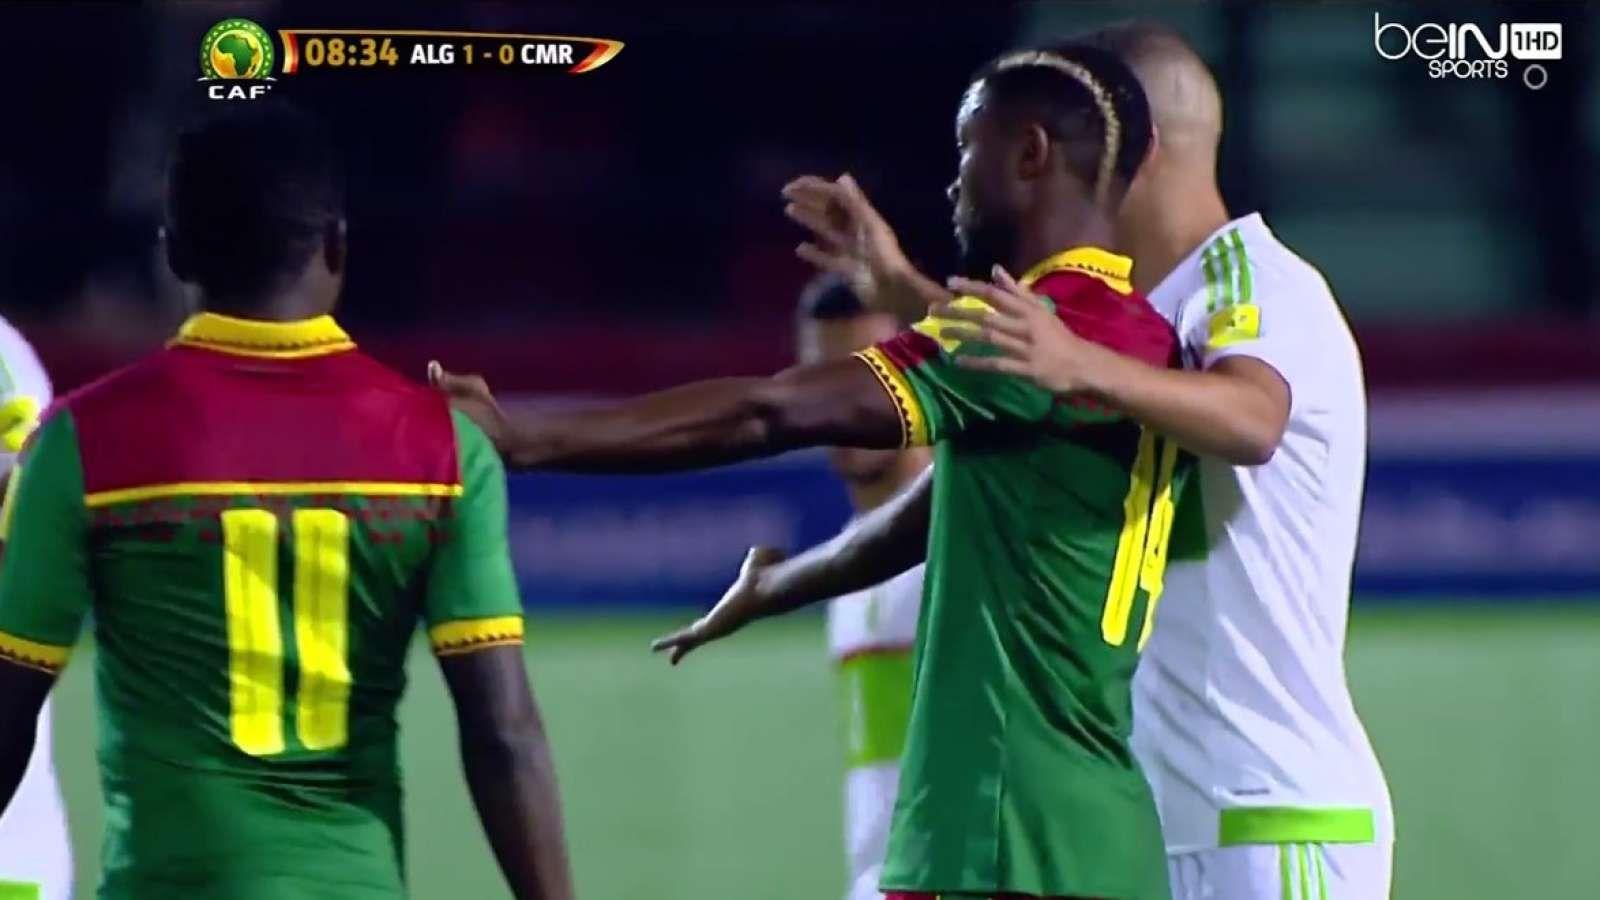 Popular Cameroon World Cup 2018 - 1f0b34388f6518de02c87a7c9eae7209  You Should Have_84968 .jpg